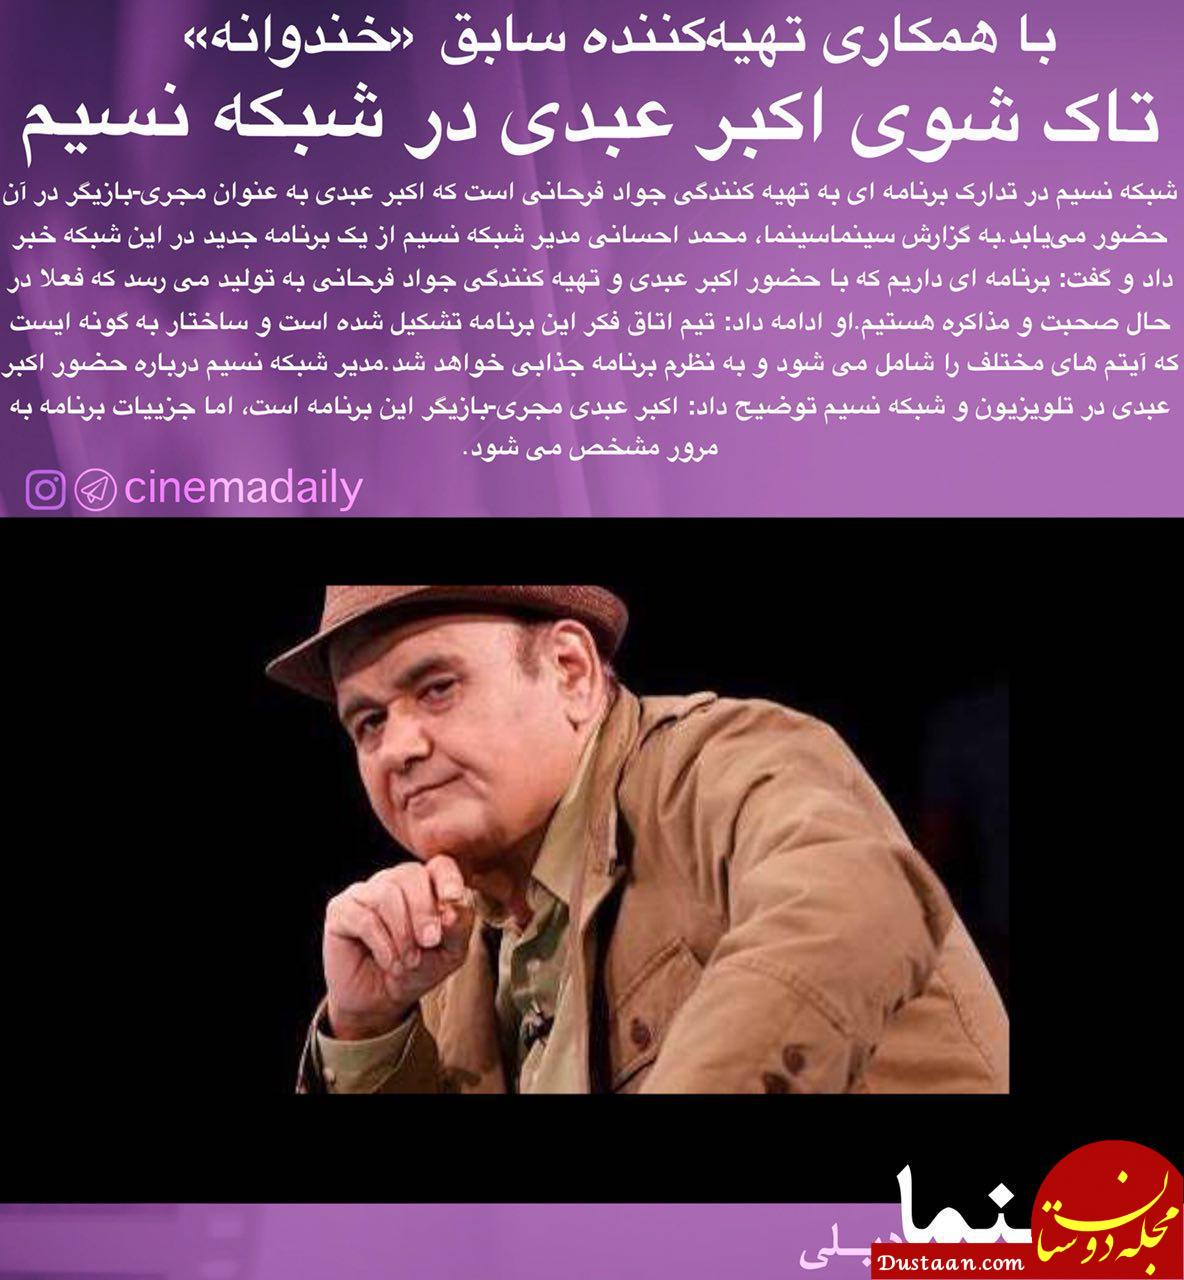 www.dustaan.com اکبری عبدی مجری تلویزیون می شود +عکس